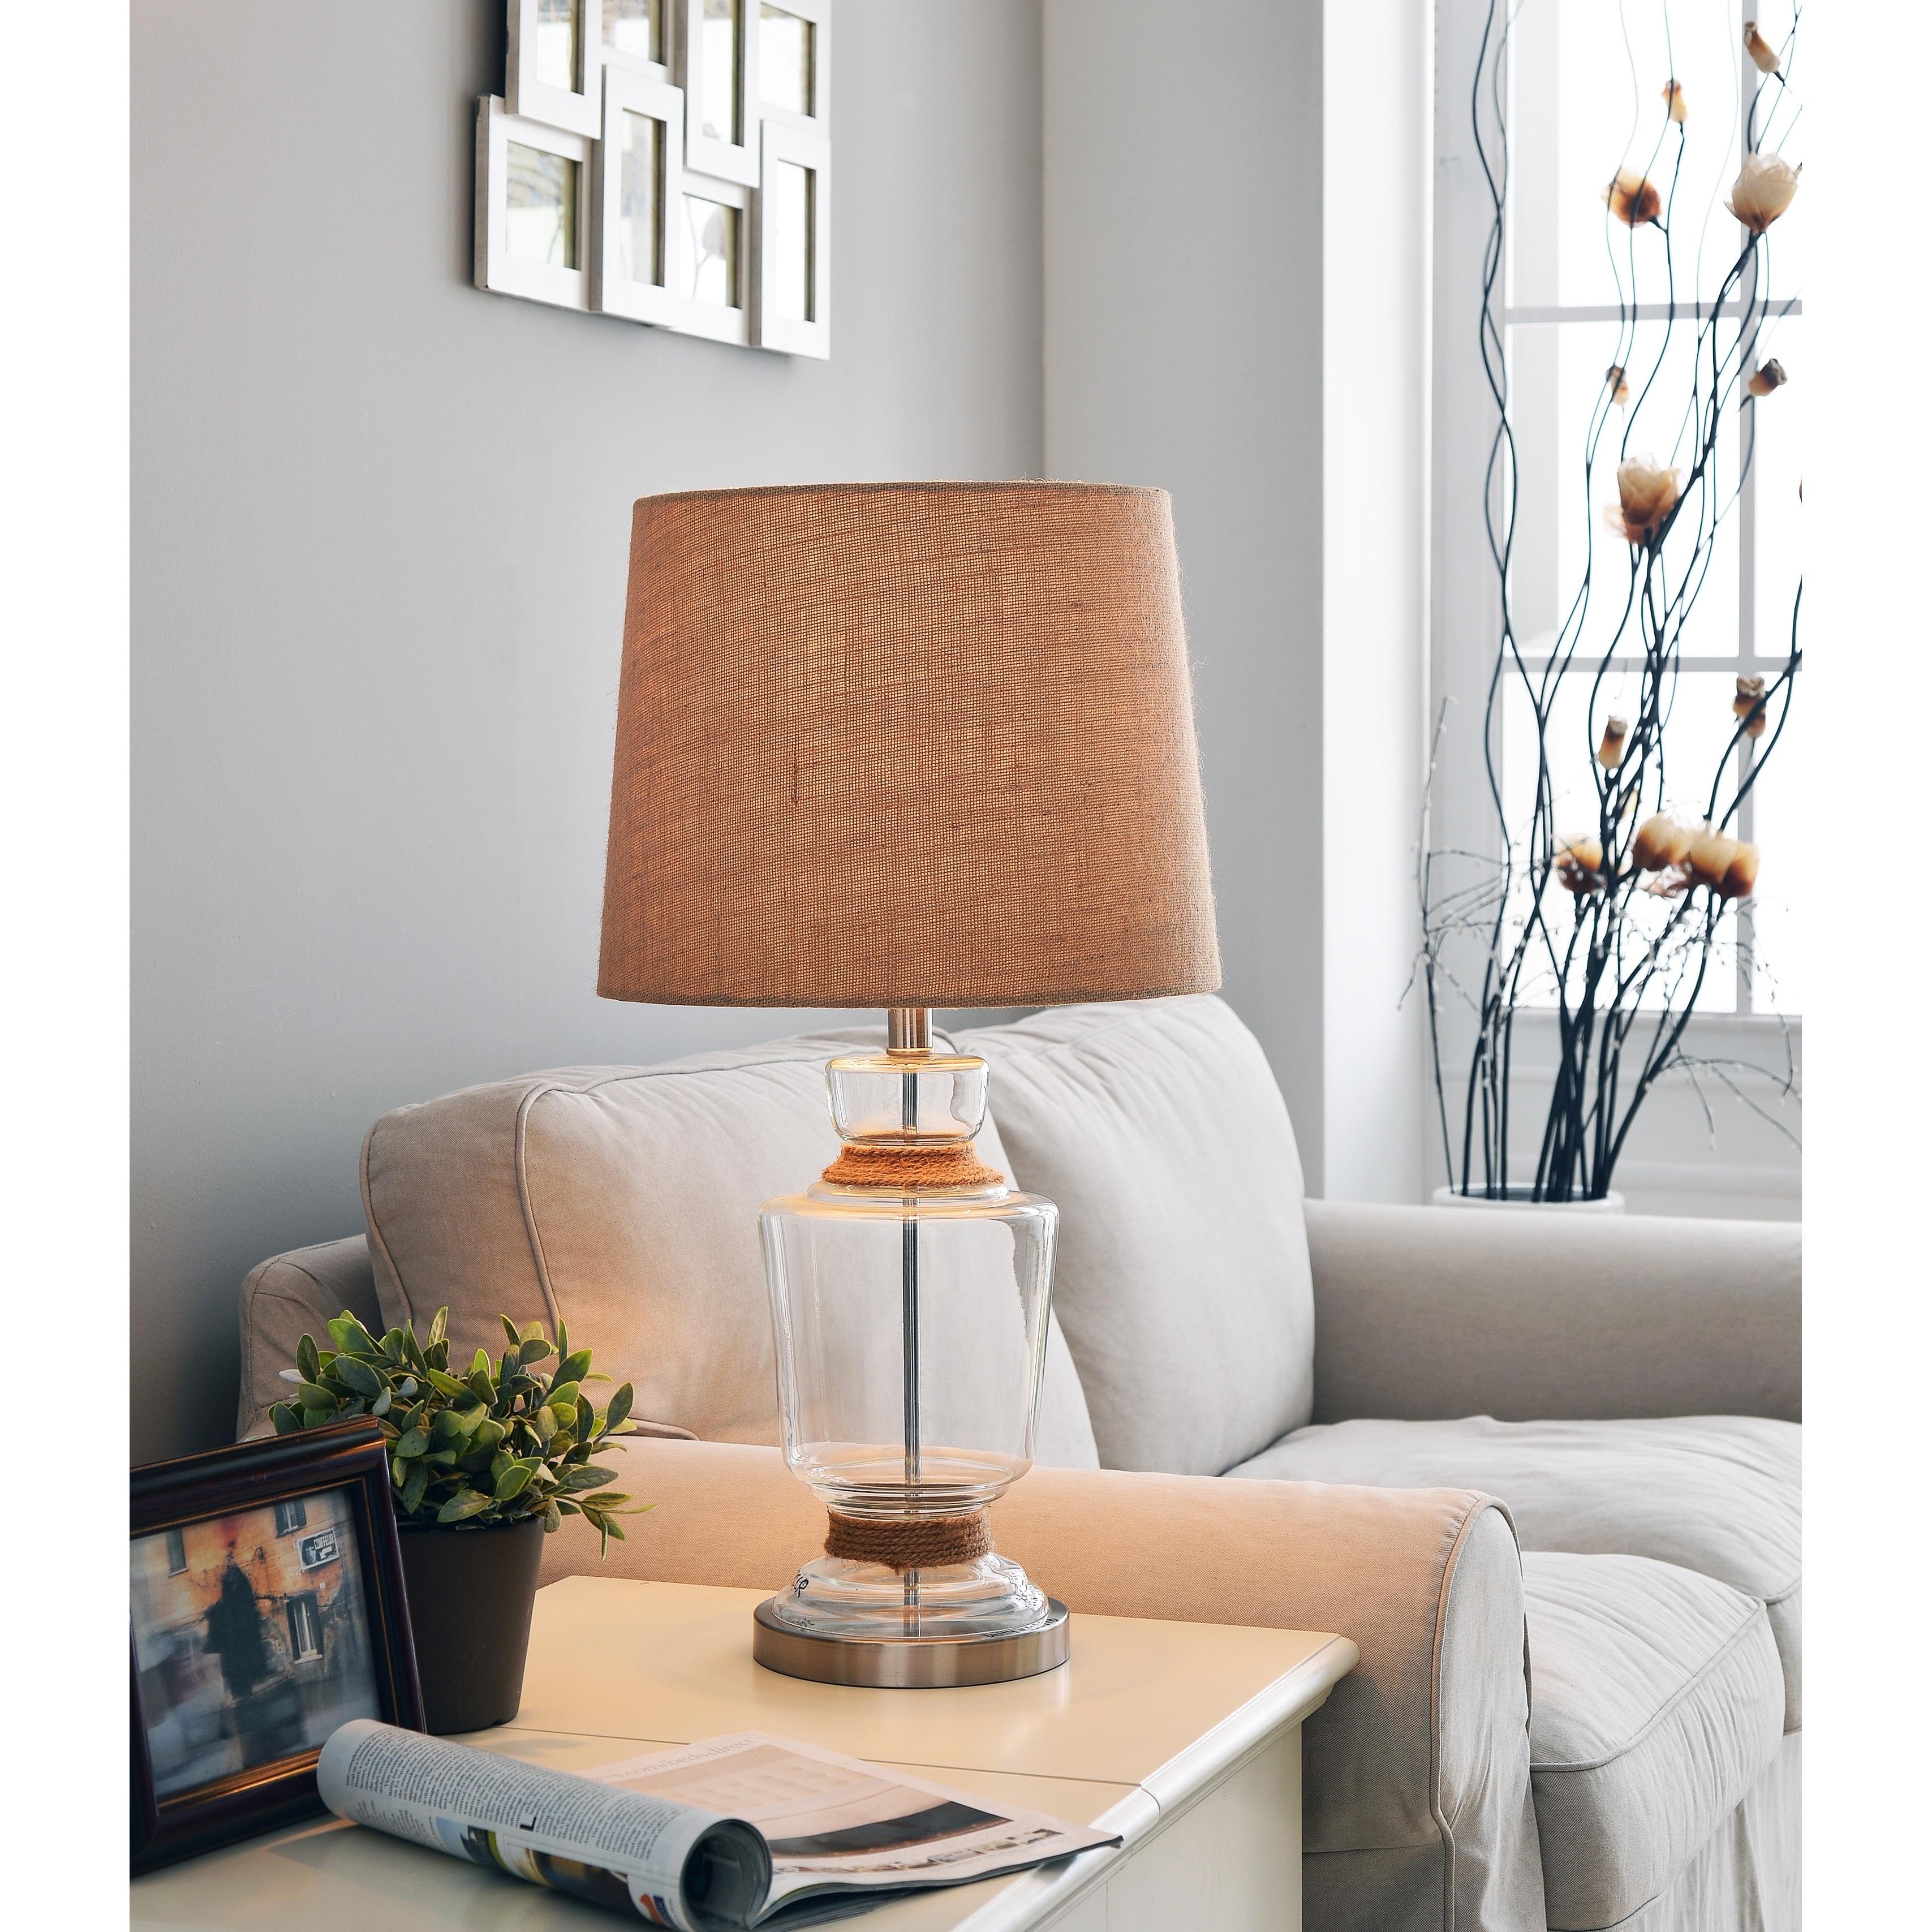 Design Craft Malibu Table Lamp, Brown (Glass)